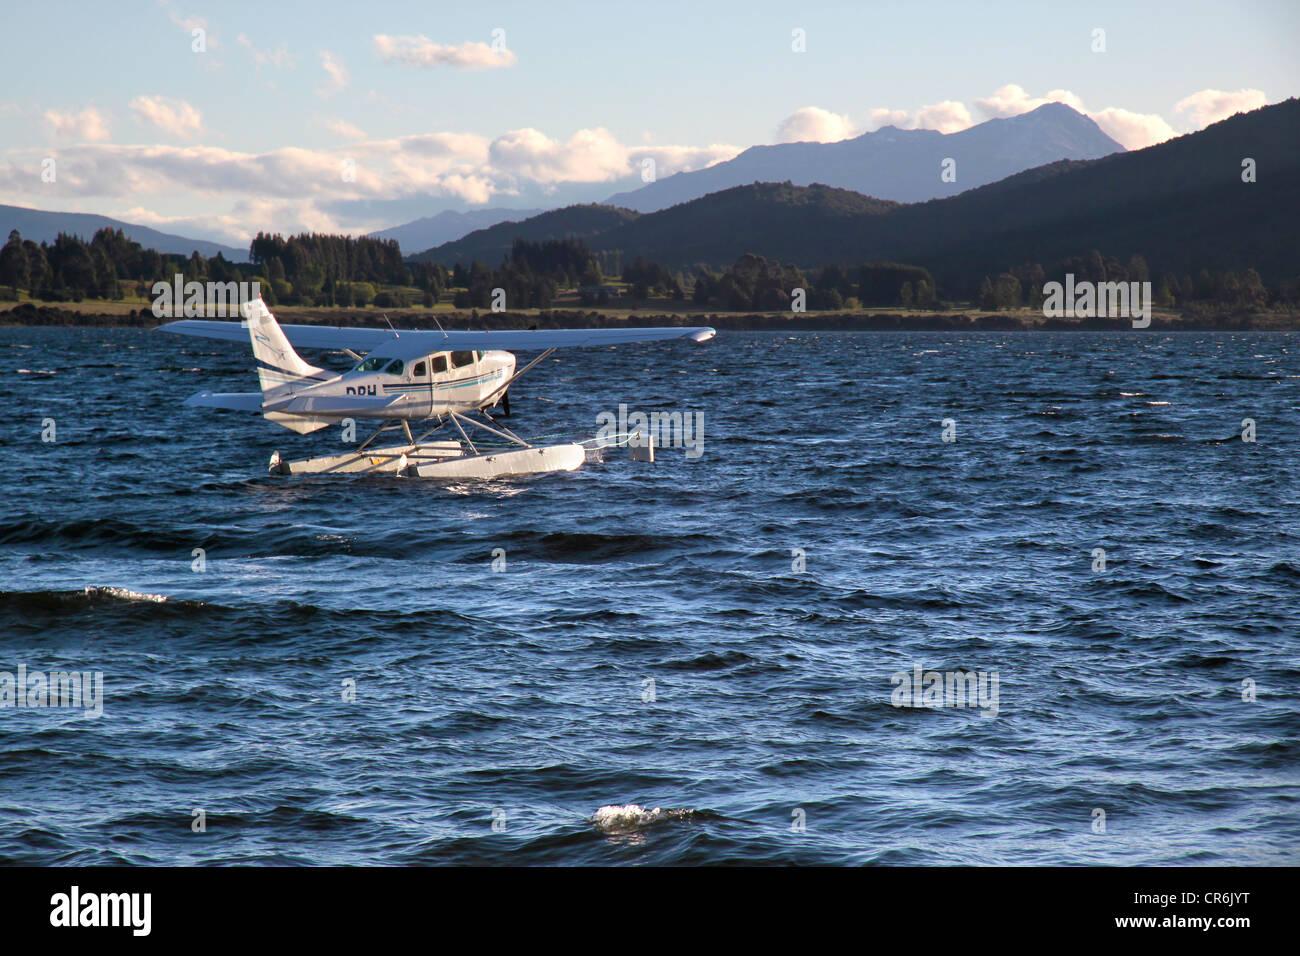 Flying boat on the Lake Te Anau, South island, New Zealand - Stock Image